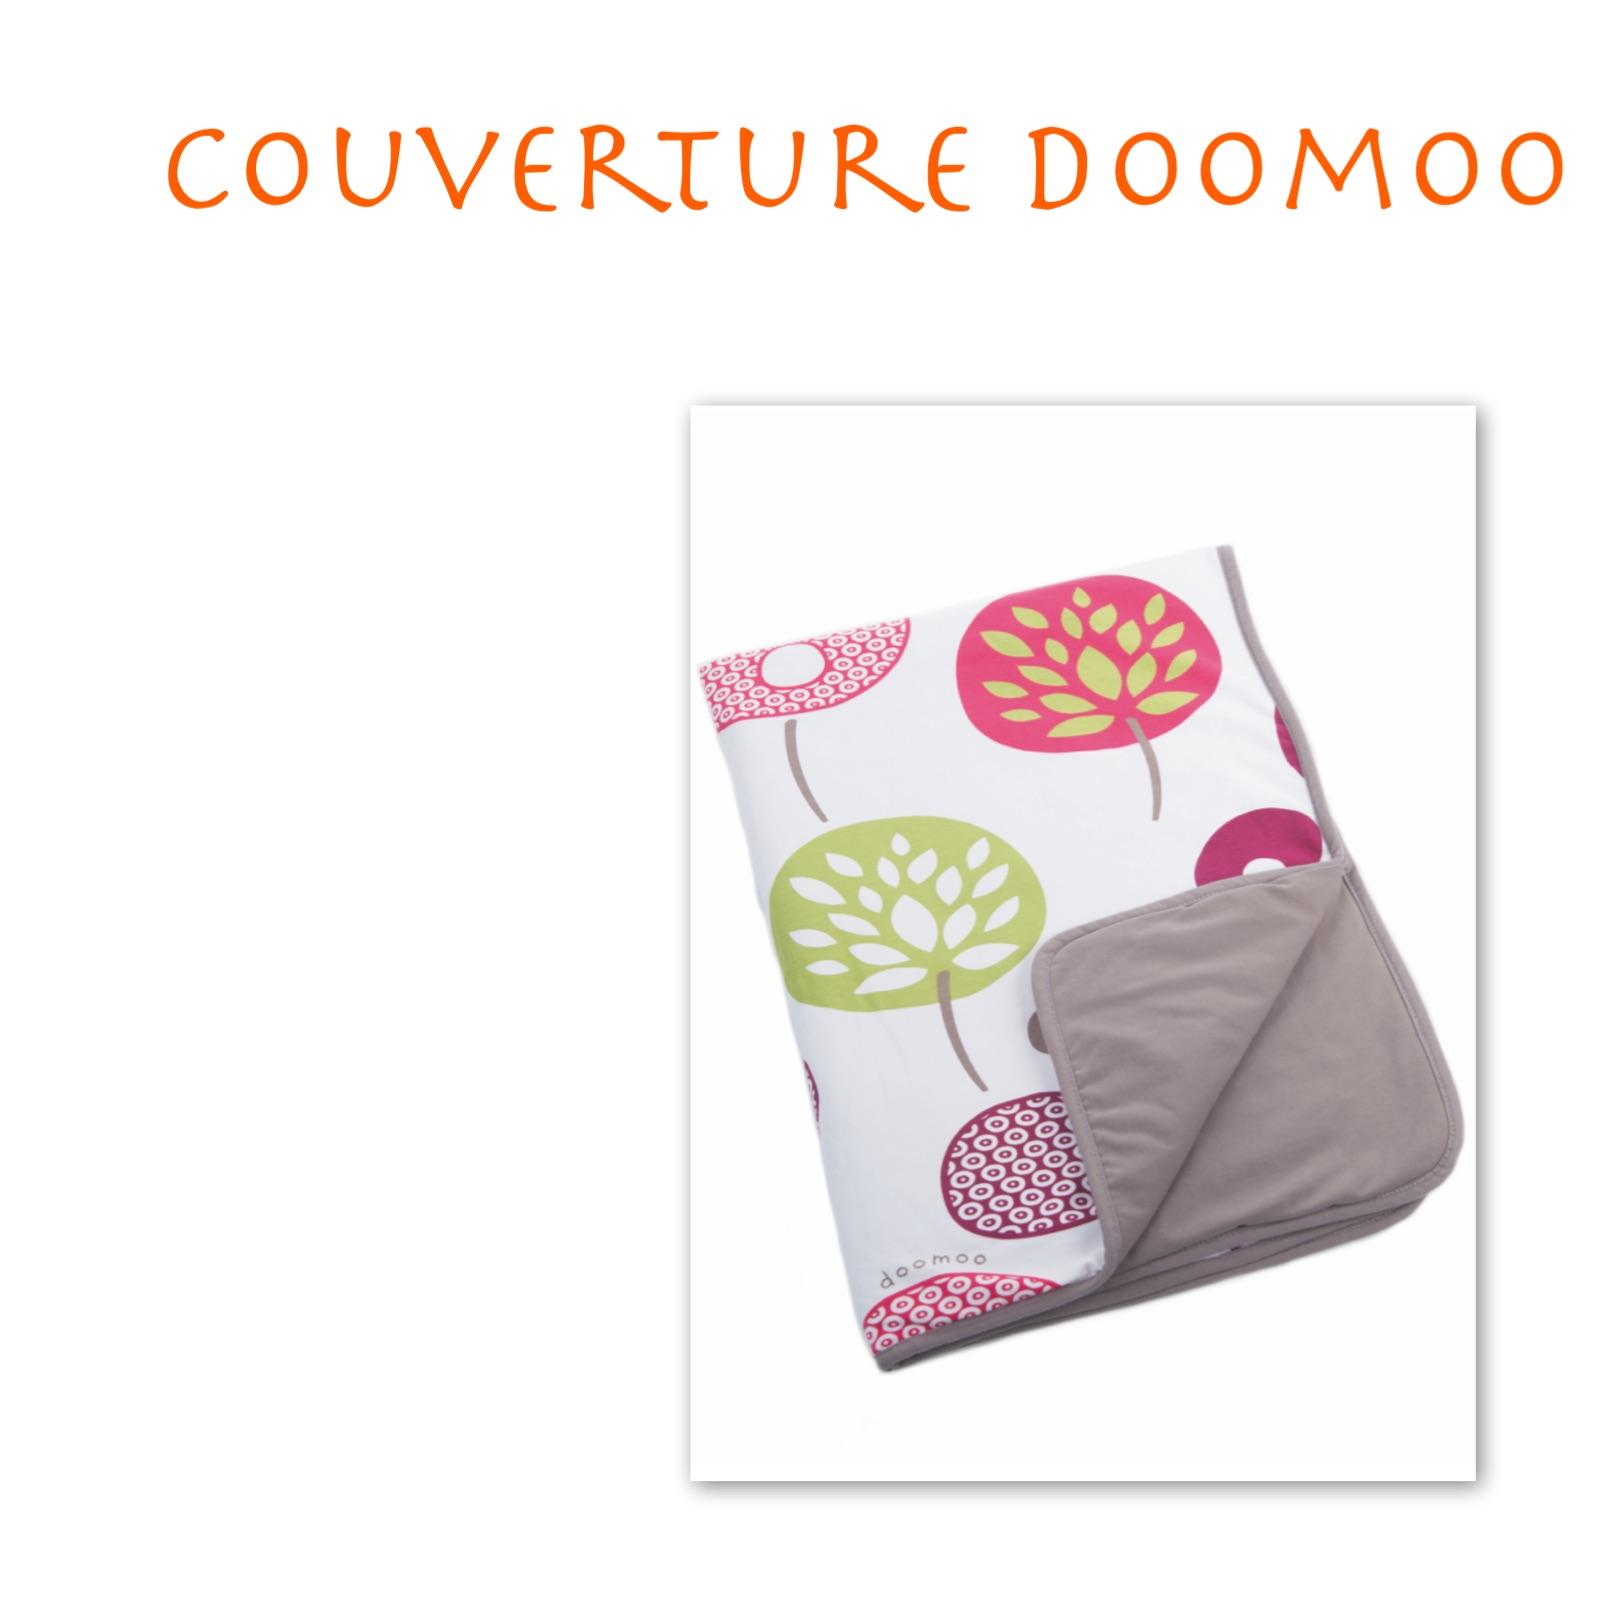 Couverture Doomoo